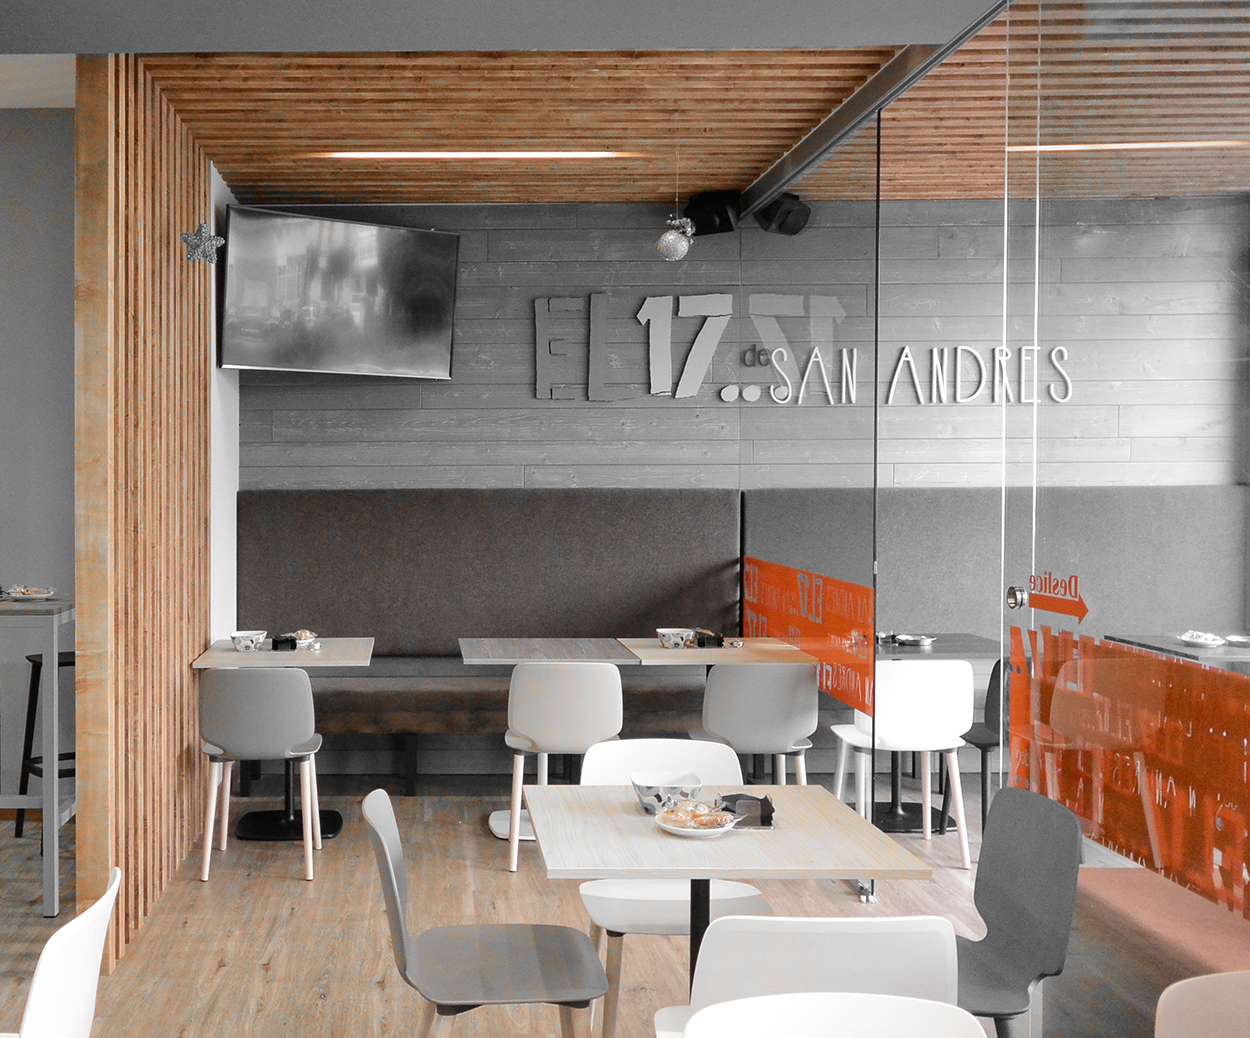 dise o interiores caf bar el 17 de san andr s On diseno de interiores 17